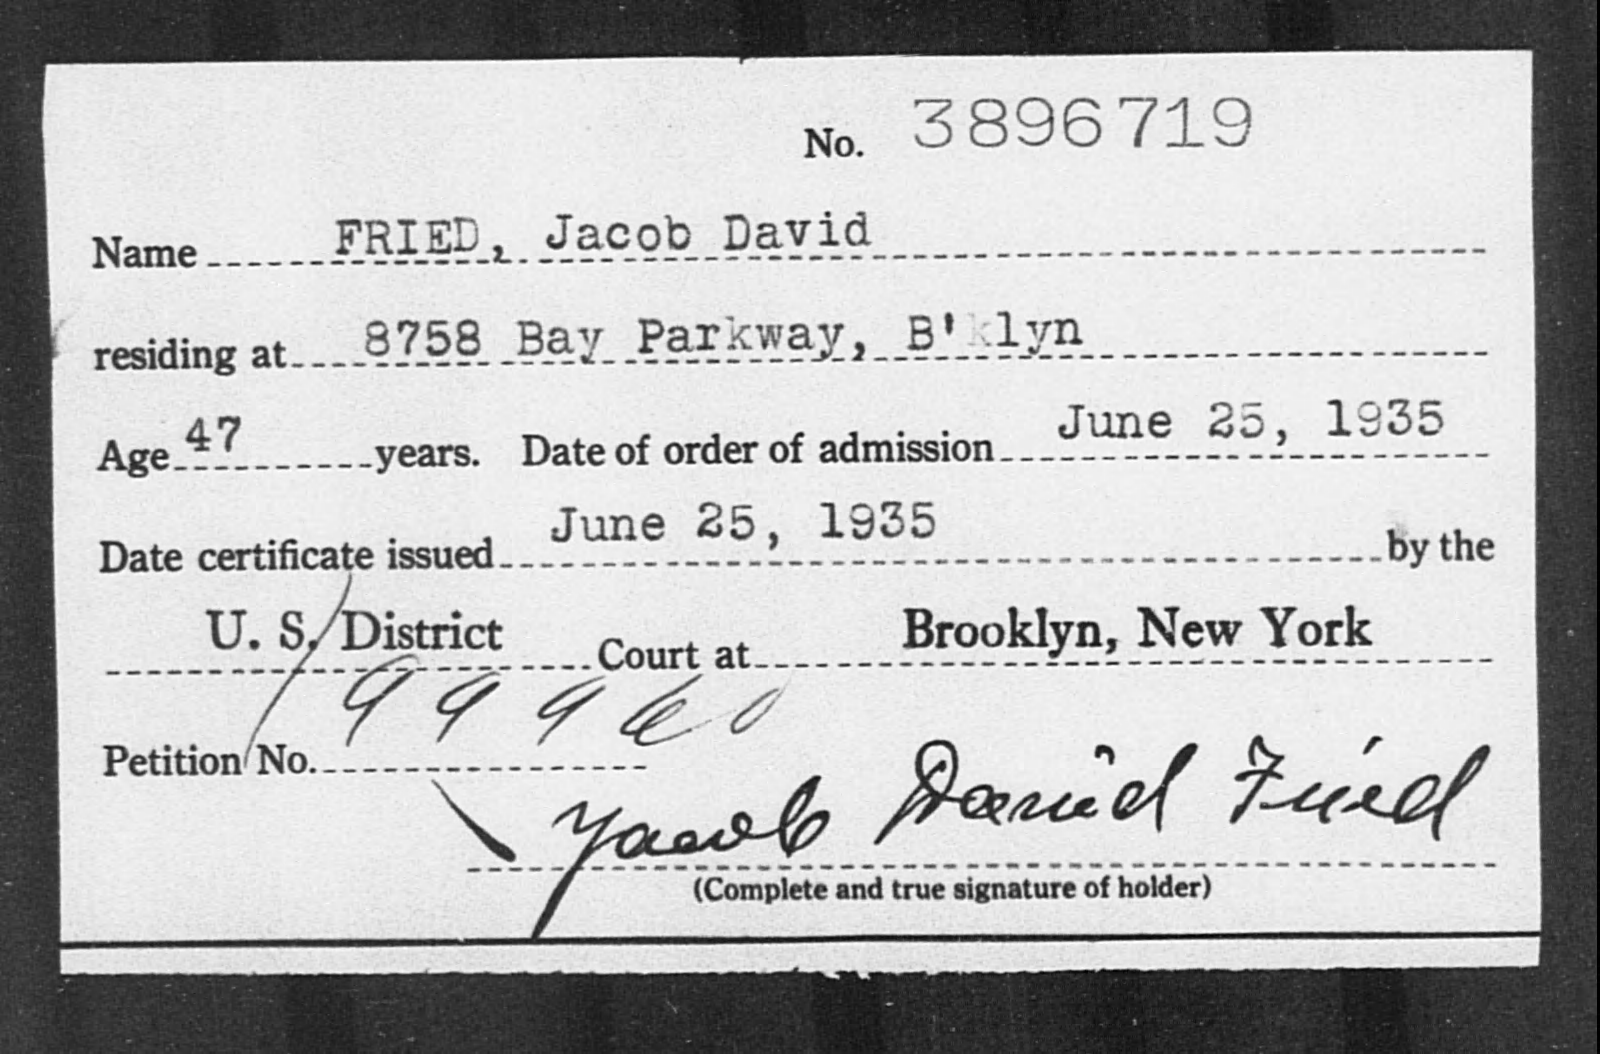 FRIED, Jacob David - Born: [BLANK], Naturalized: 1935